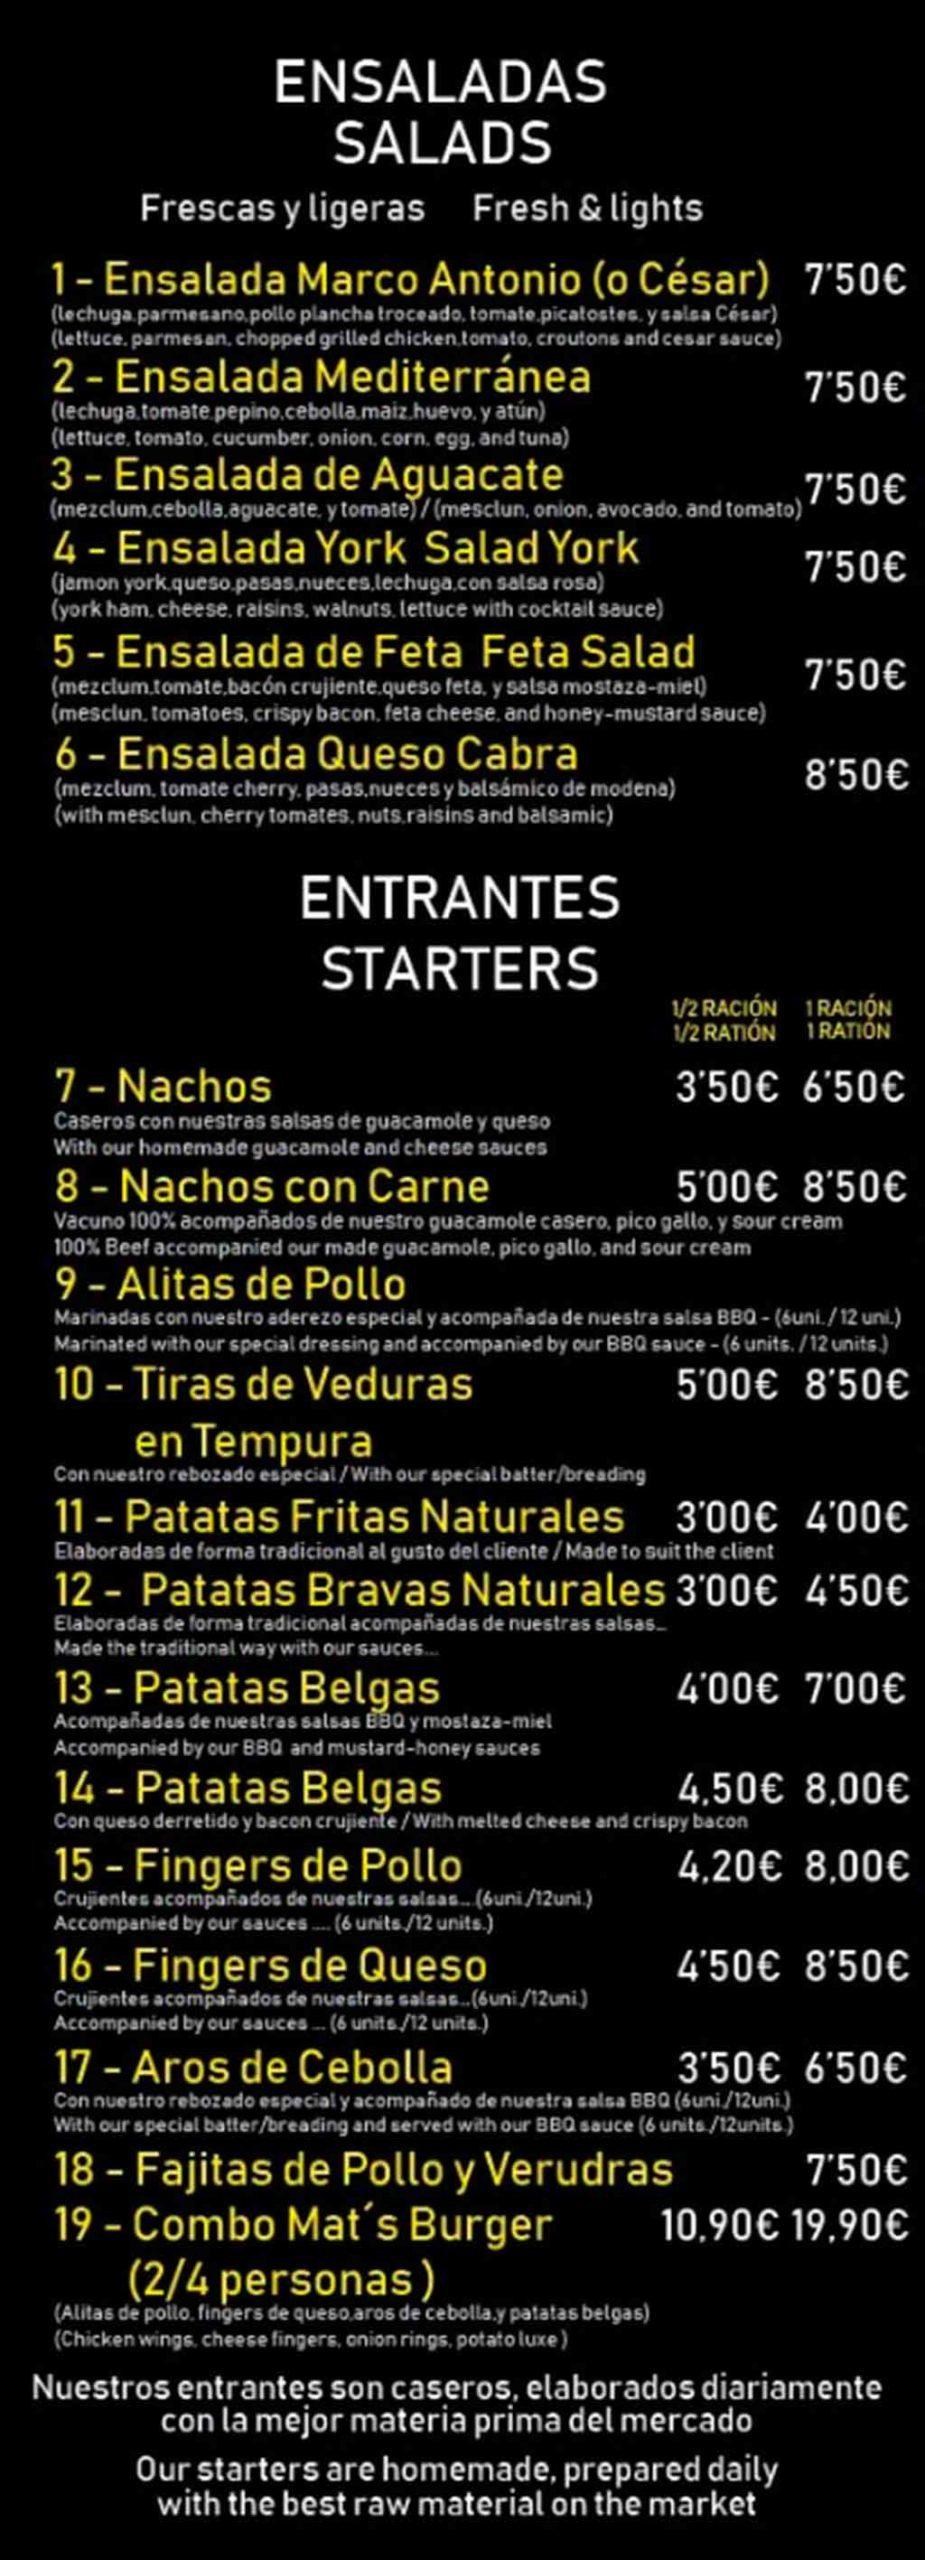 Carta-servicio-a-domicilio-Take-Away-Mats-Burger-Torrevieja-1